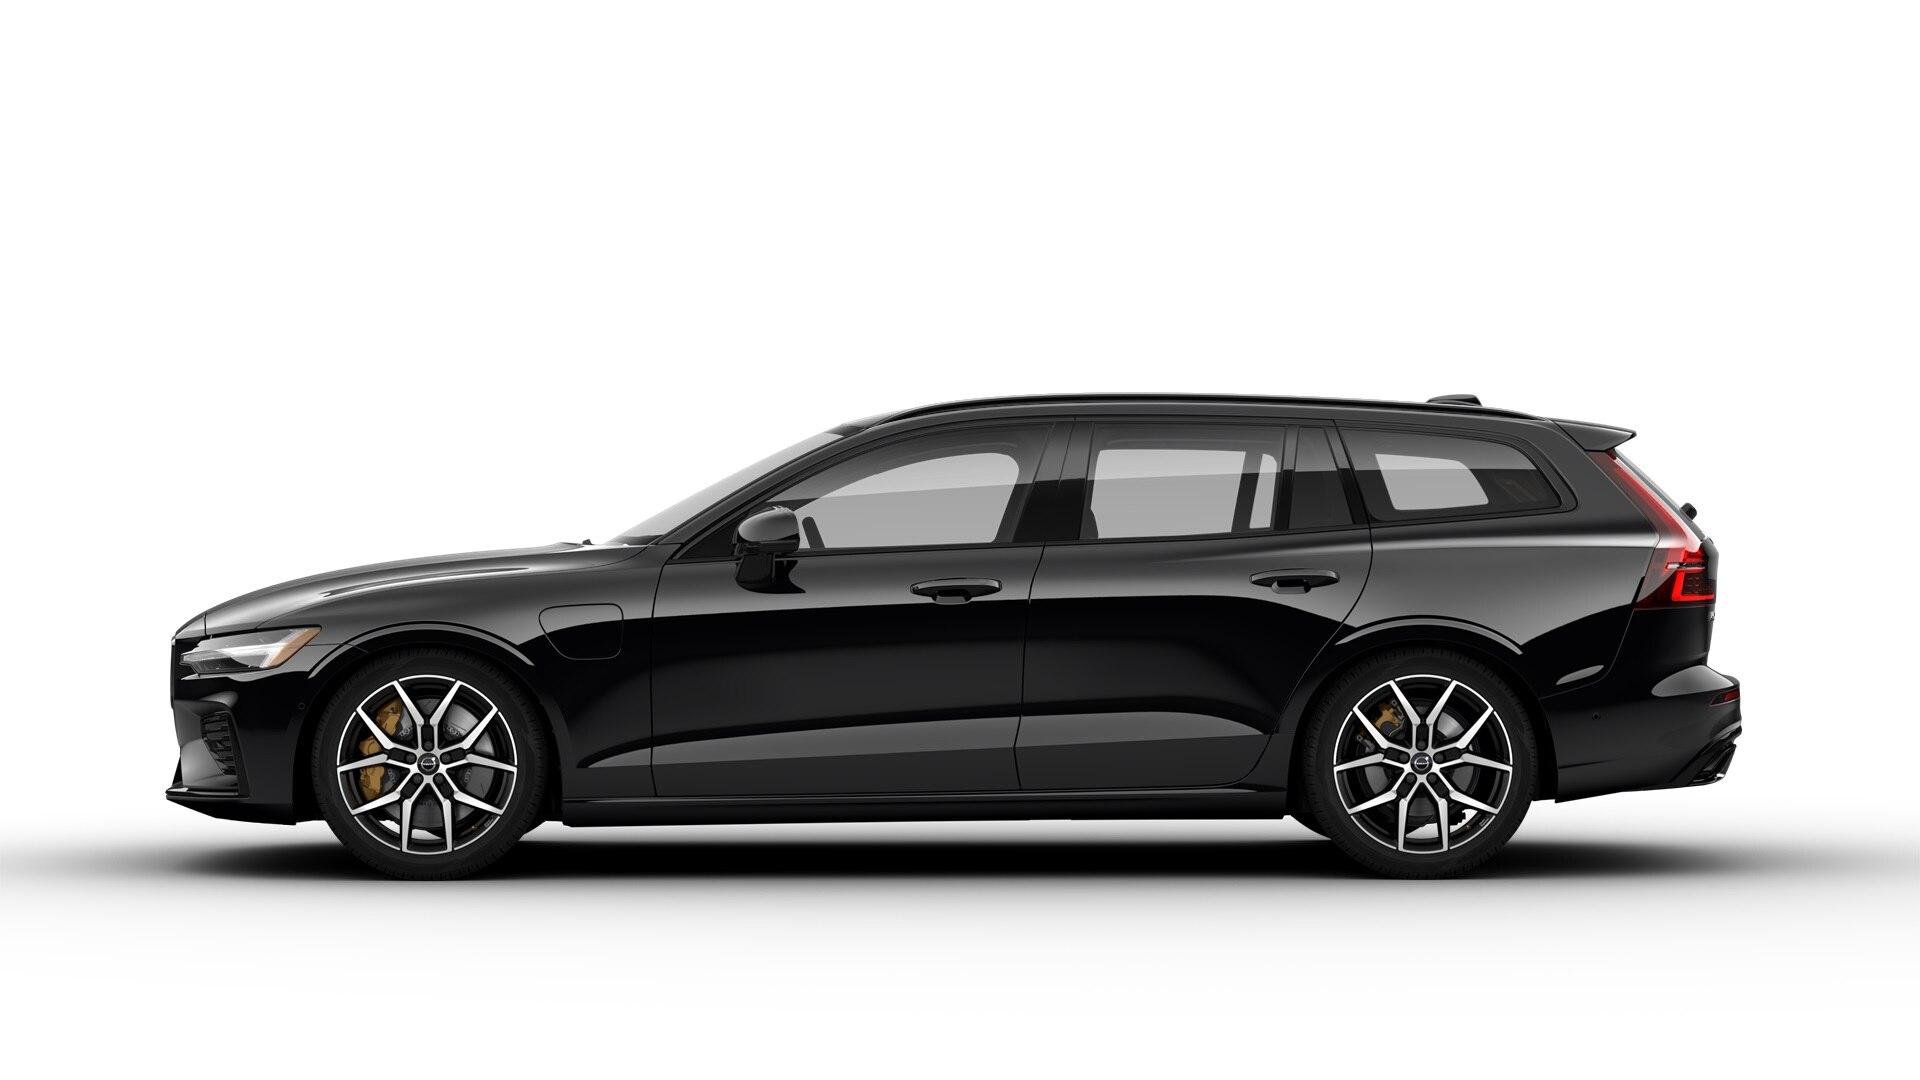 Volvo V60 2020 Pierre noire